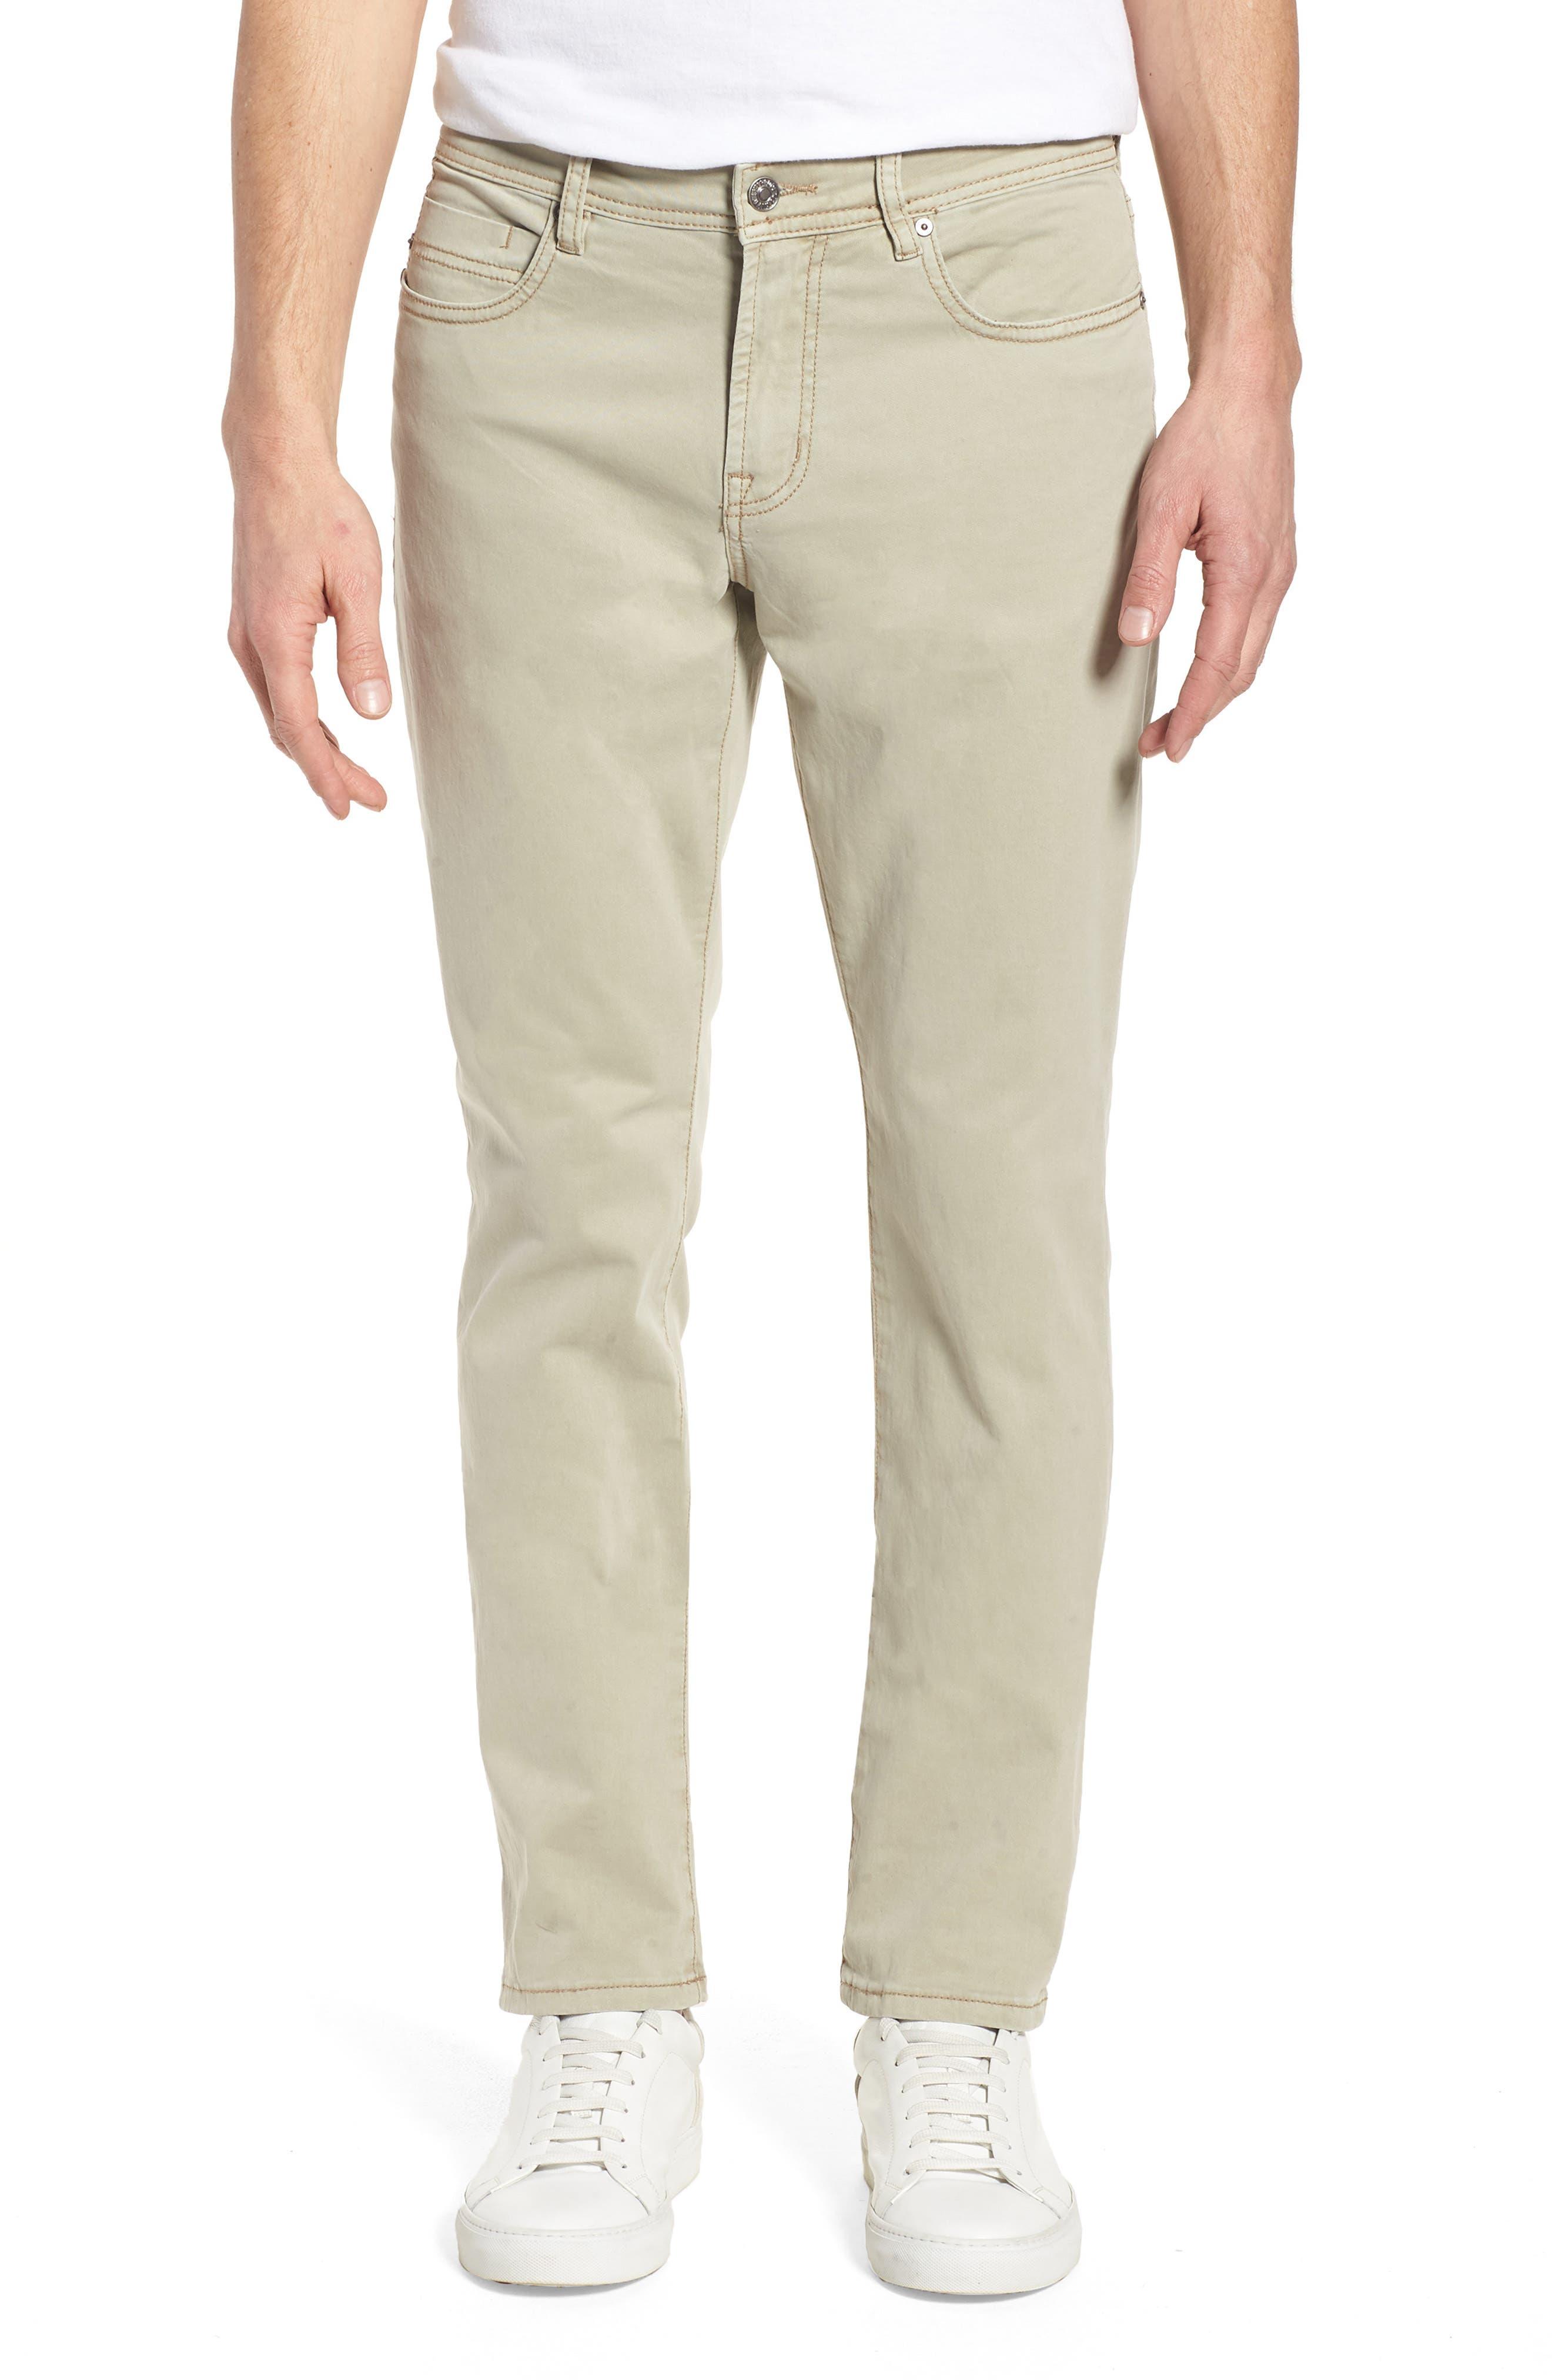 Jeans Co. Slim Straight Leg Jeans,                             Main thumbnail 1, color,                             Sandstrom